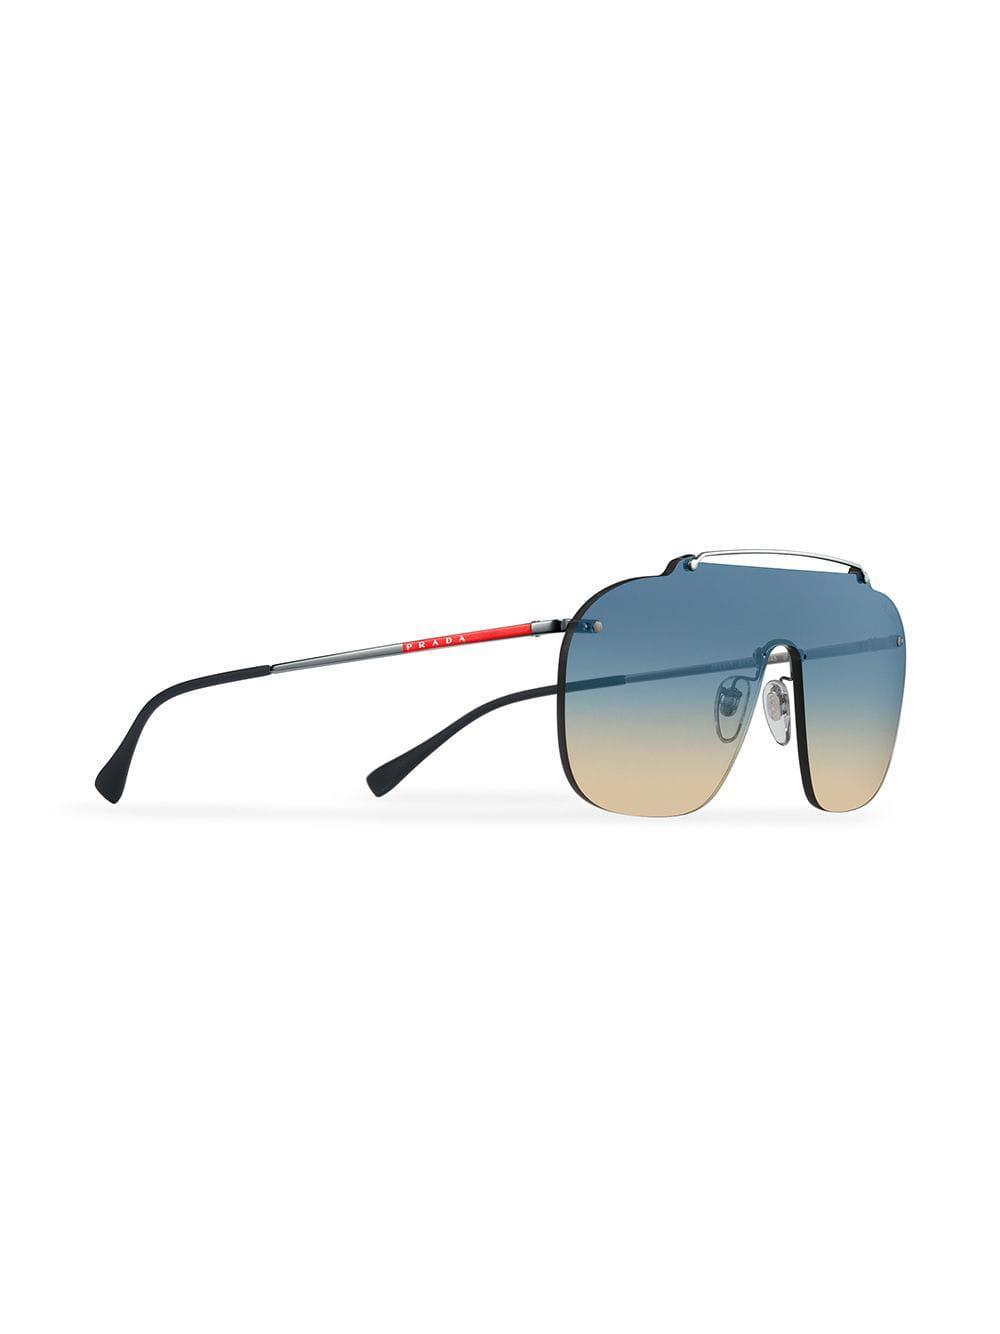 a85c4372a3 Prada - Gray Linea Rossa Constellation Sunglasses for Men - Lyst. View  fullscreen